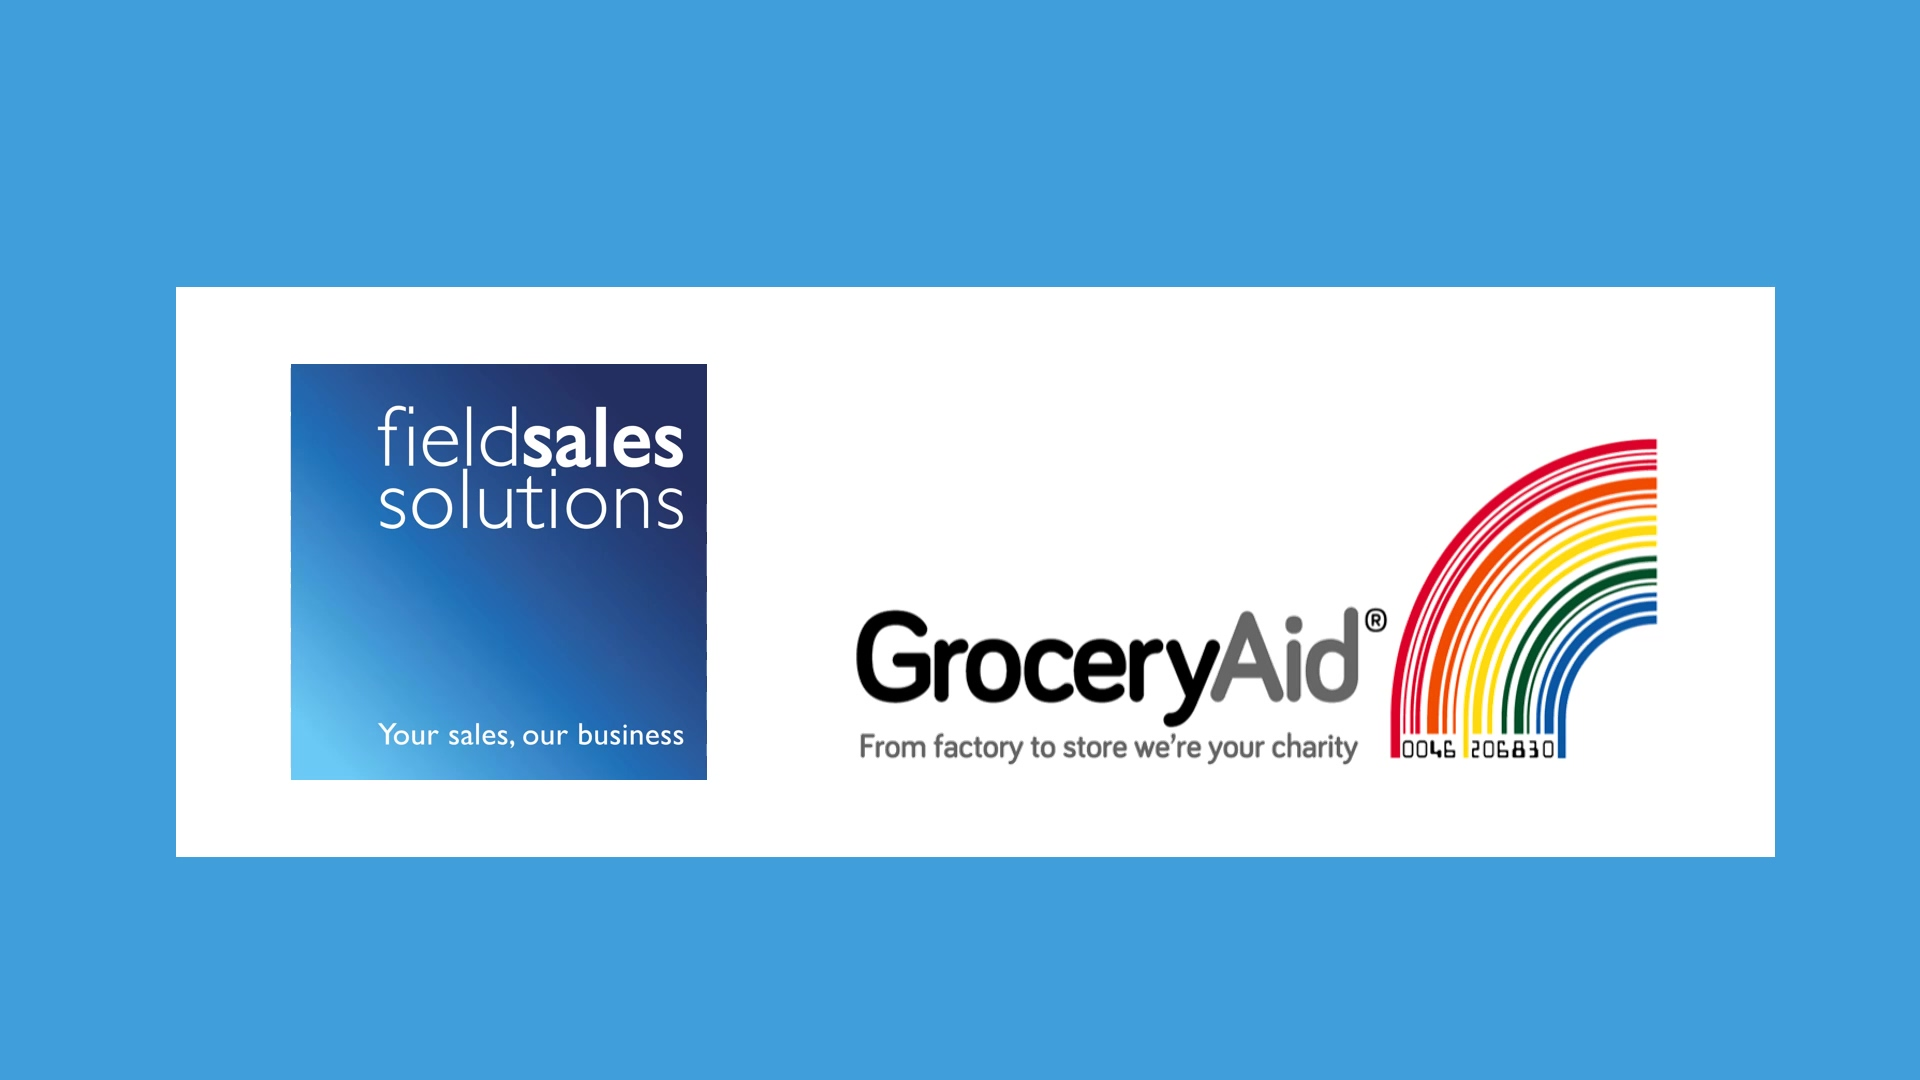 WEEK 1 - John O Groats to Lands End GroceryAid Fundraiser VIDEO